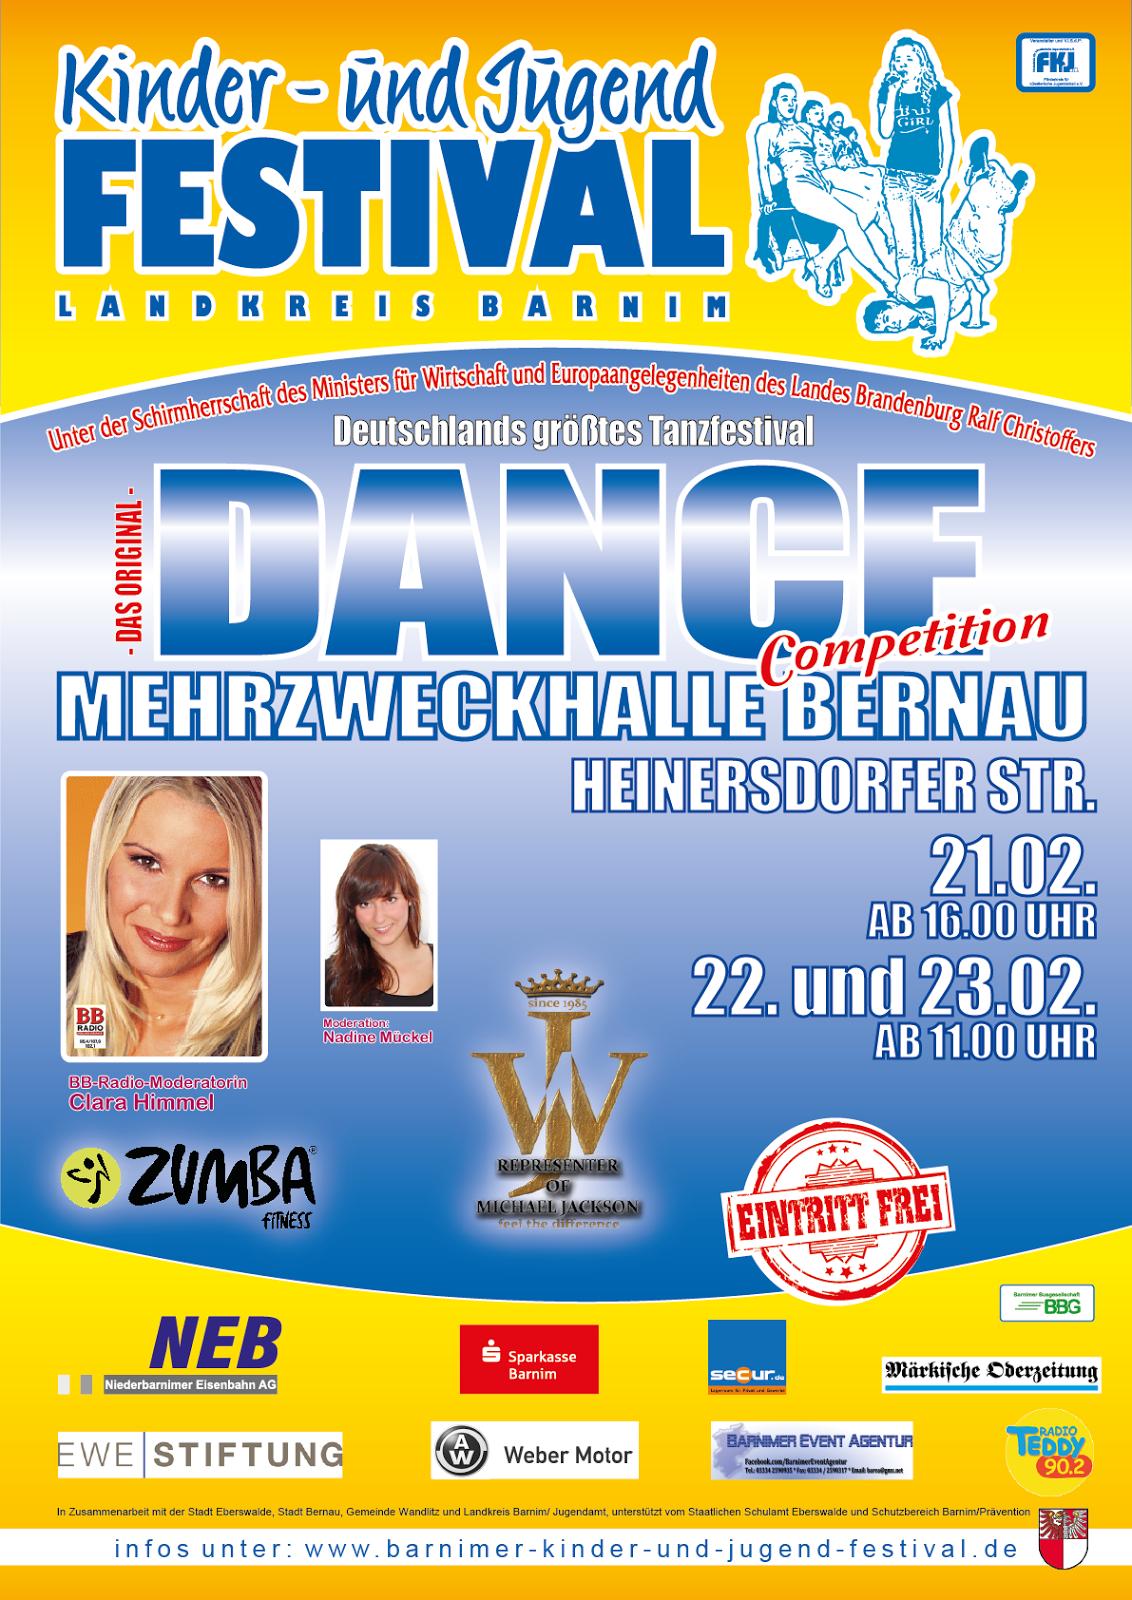 Tanzfestival+Bernau+2014+A2+Poster 01